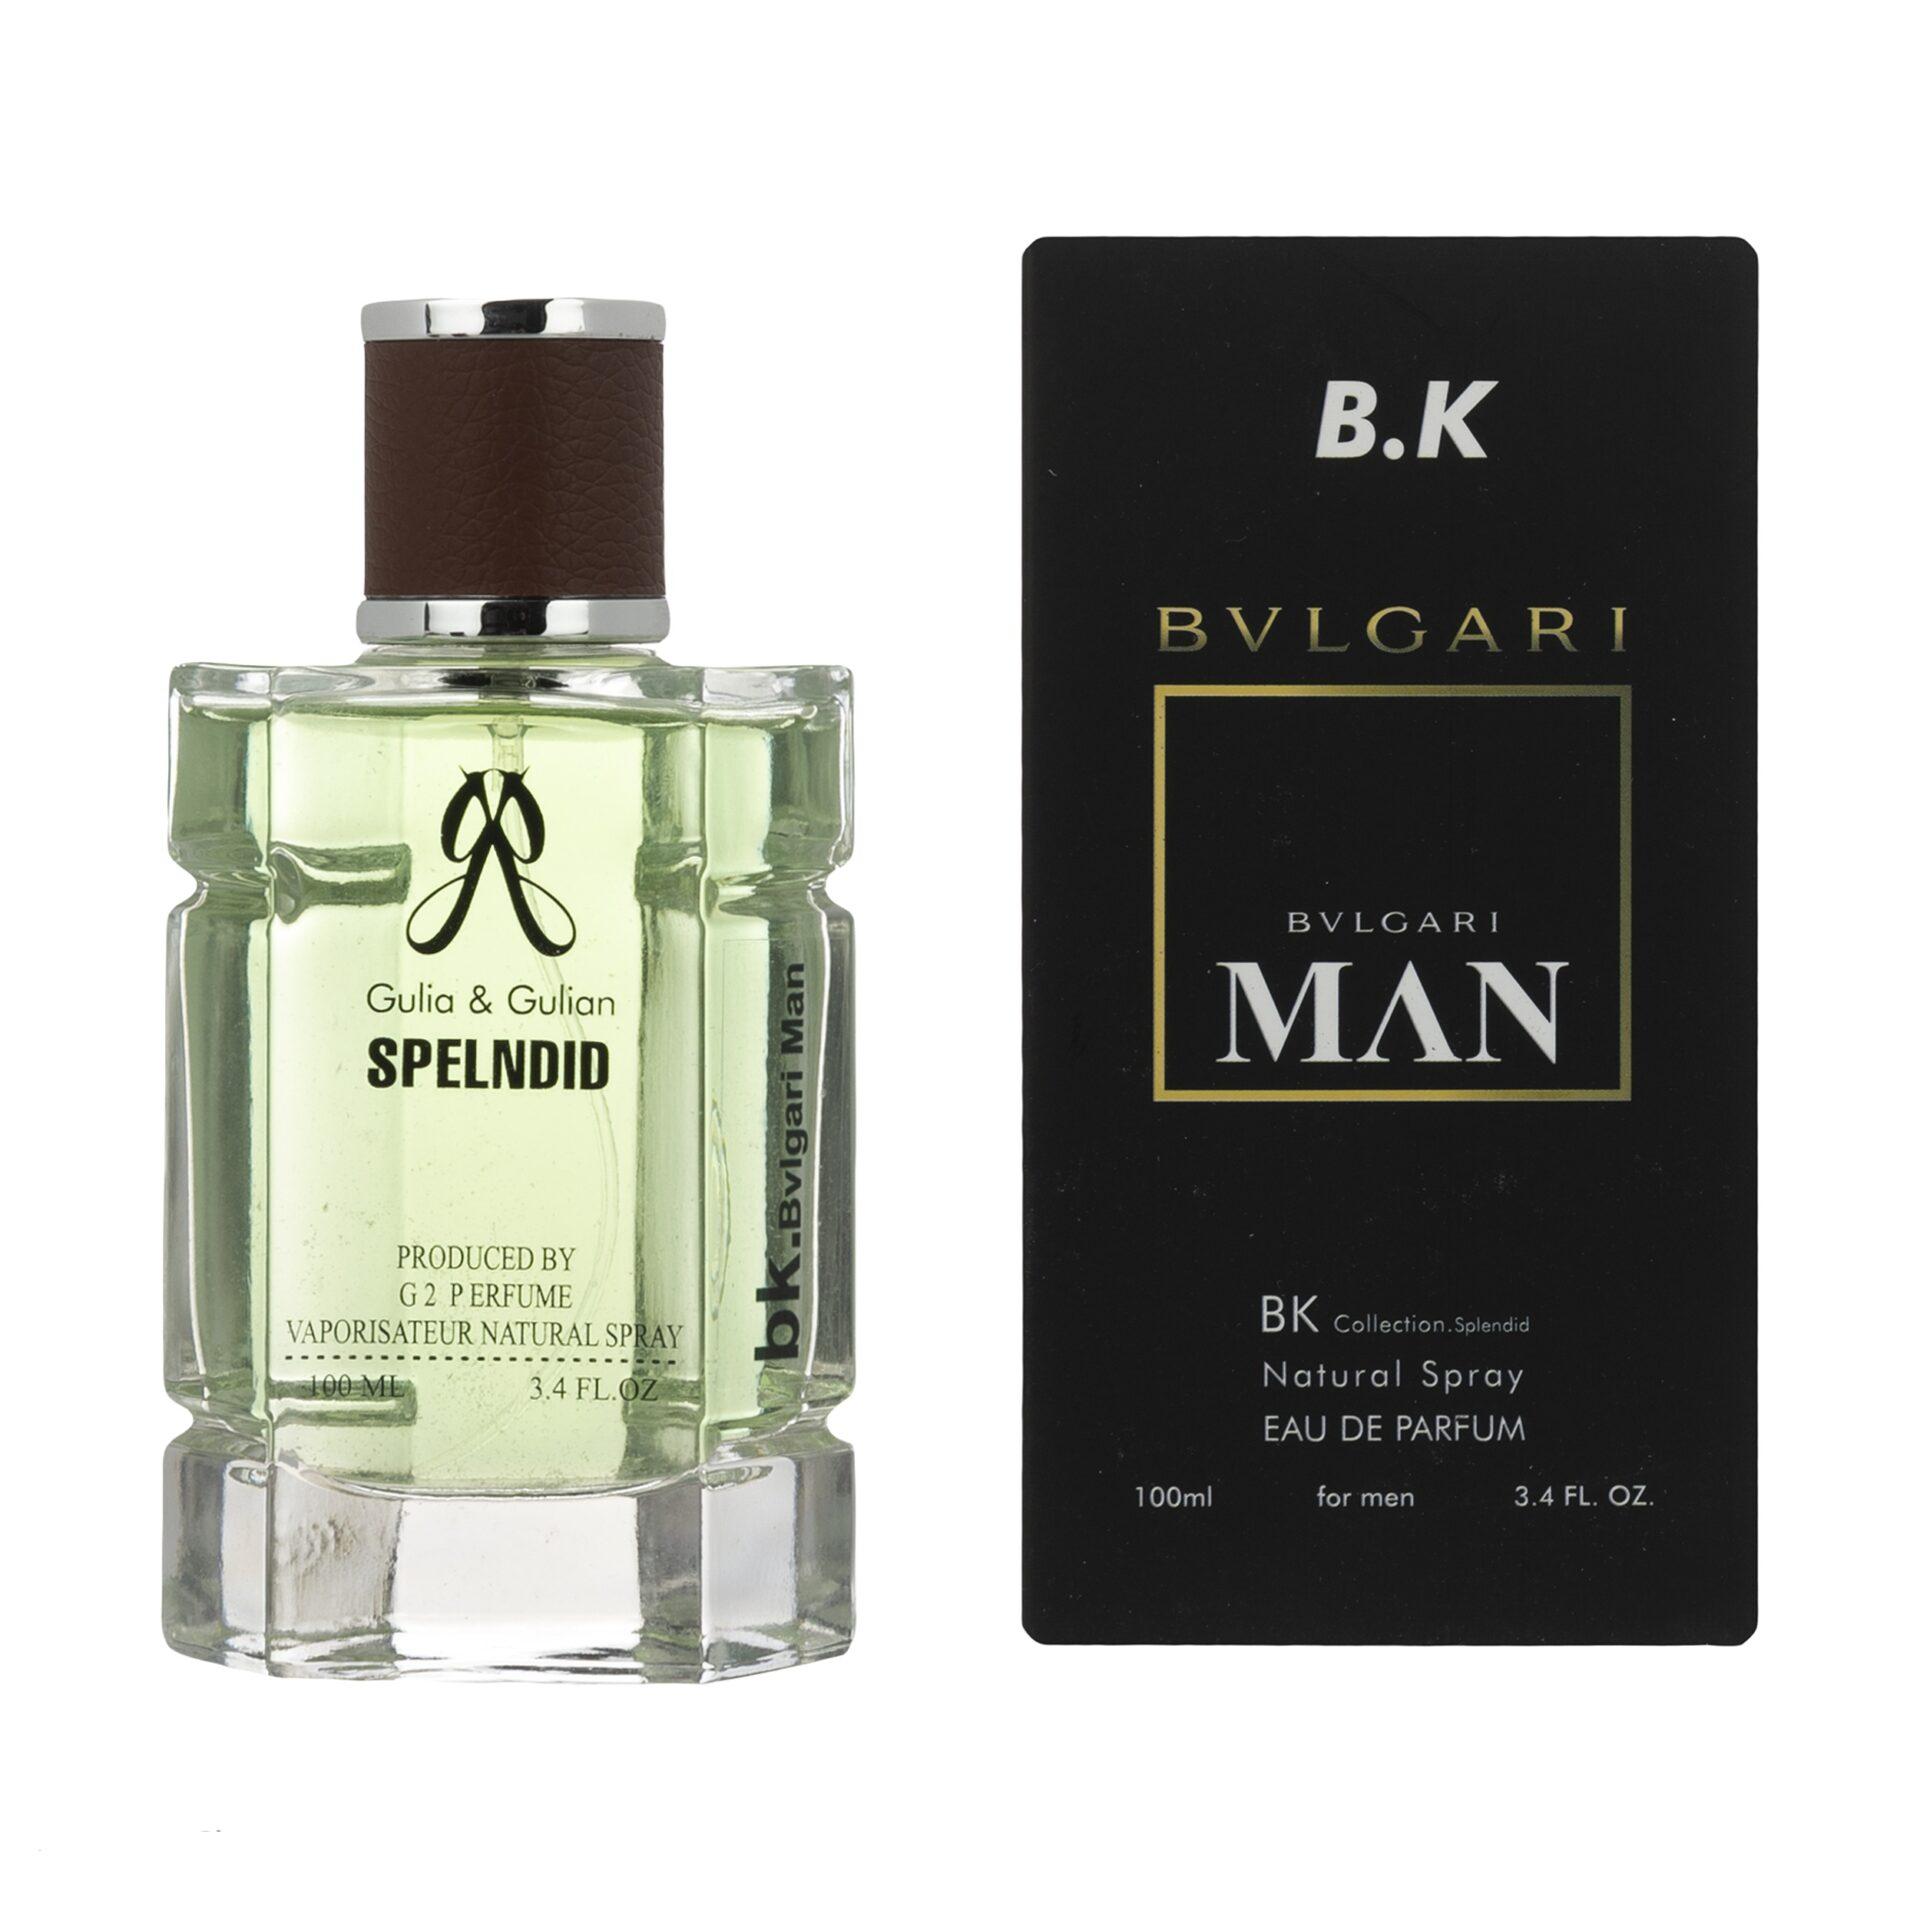 ادوپرفیوم مردانه بی کی مدل Man In Black حجم 100 میلی لیتر